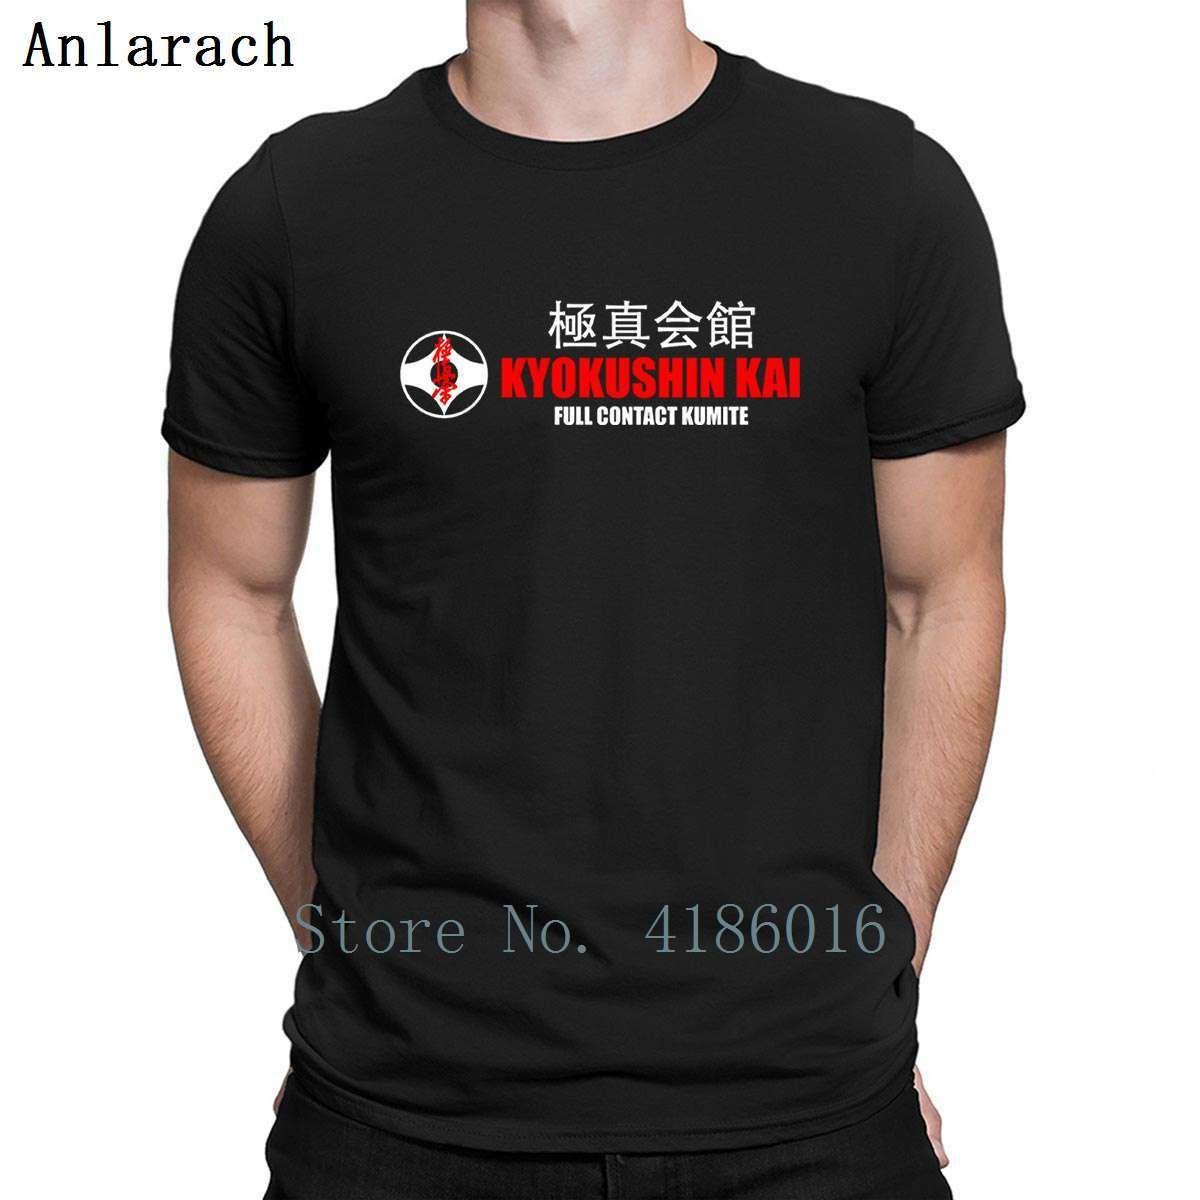 Kyokushinkai Karate Camiseta Academia de algodão estampado Kawaii Vintage Primavera Outono Humor O-Neck Shirt